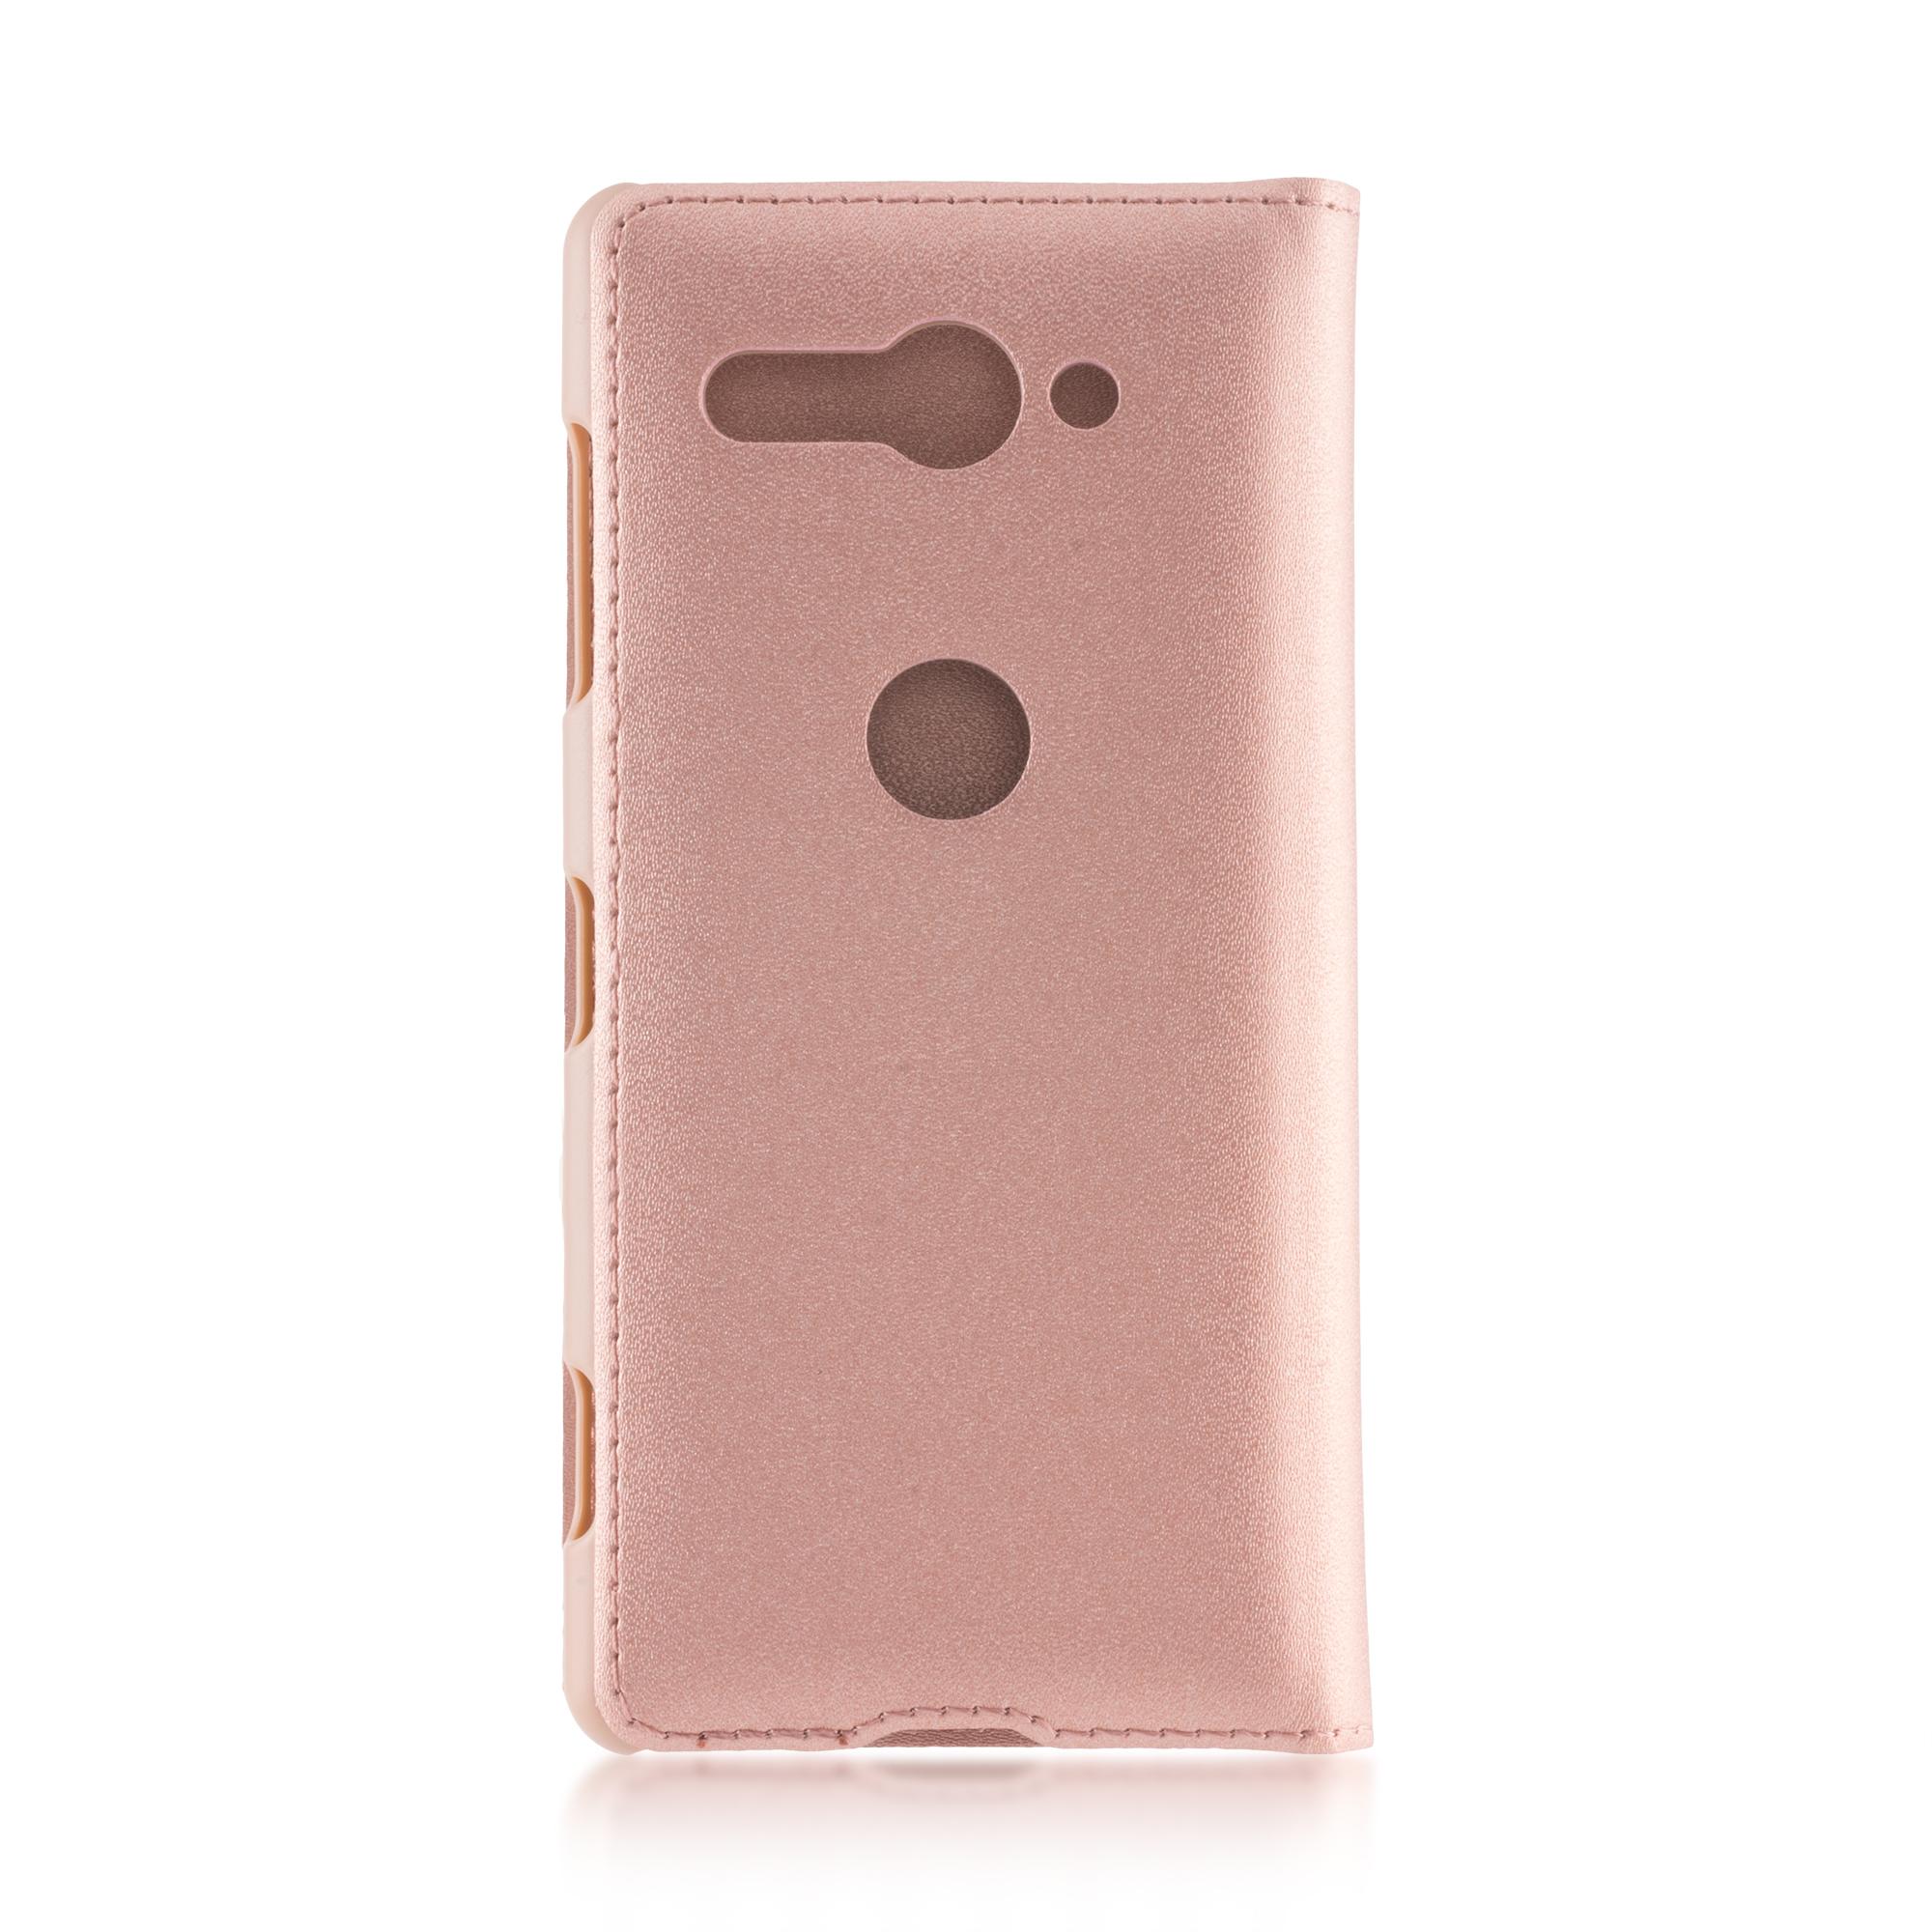 Чехол-книжка розового цвета для Xperia XZ2 Compact